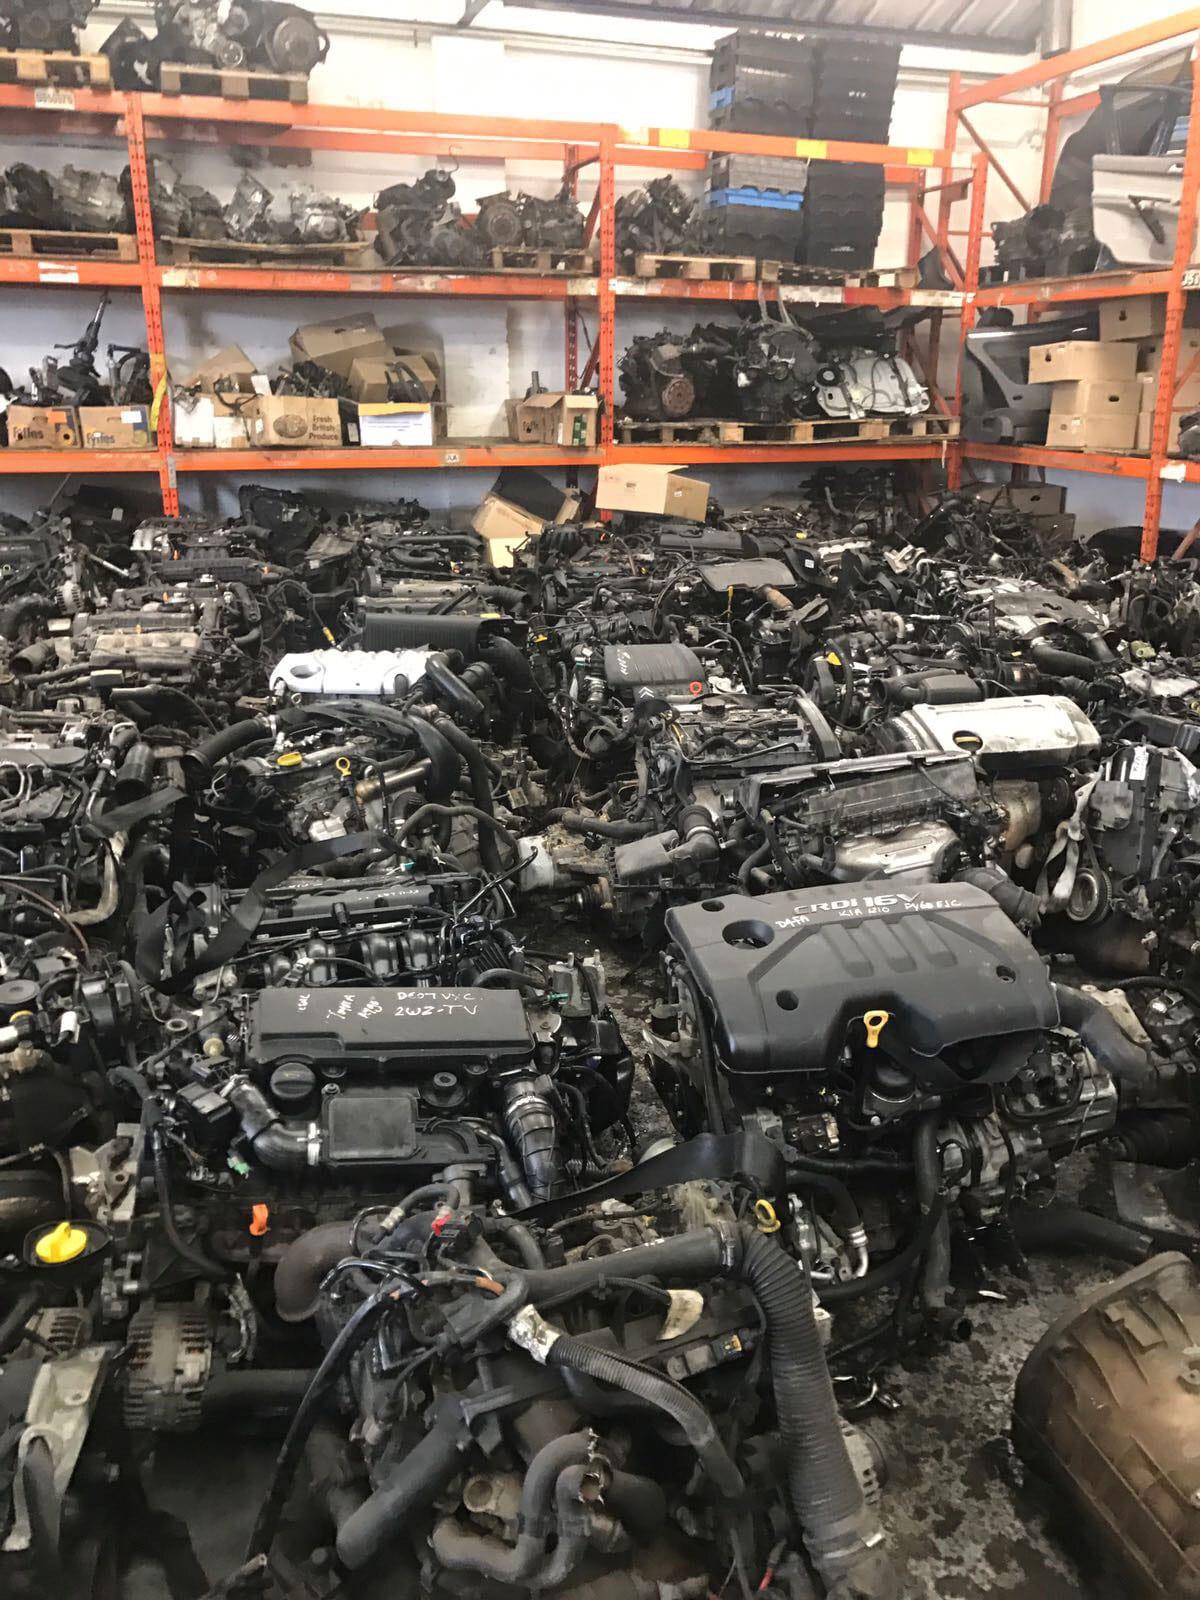 Room full of salvaged engines